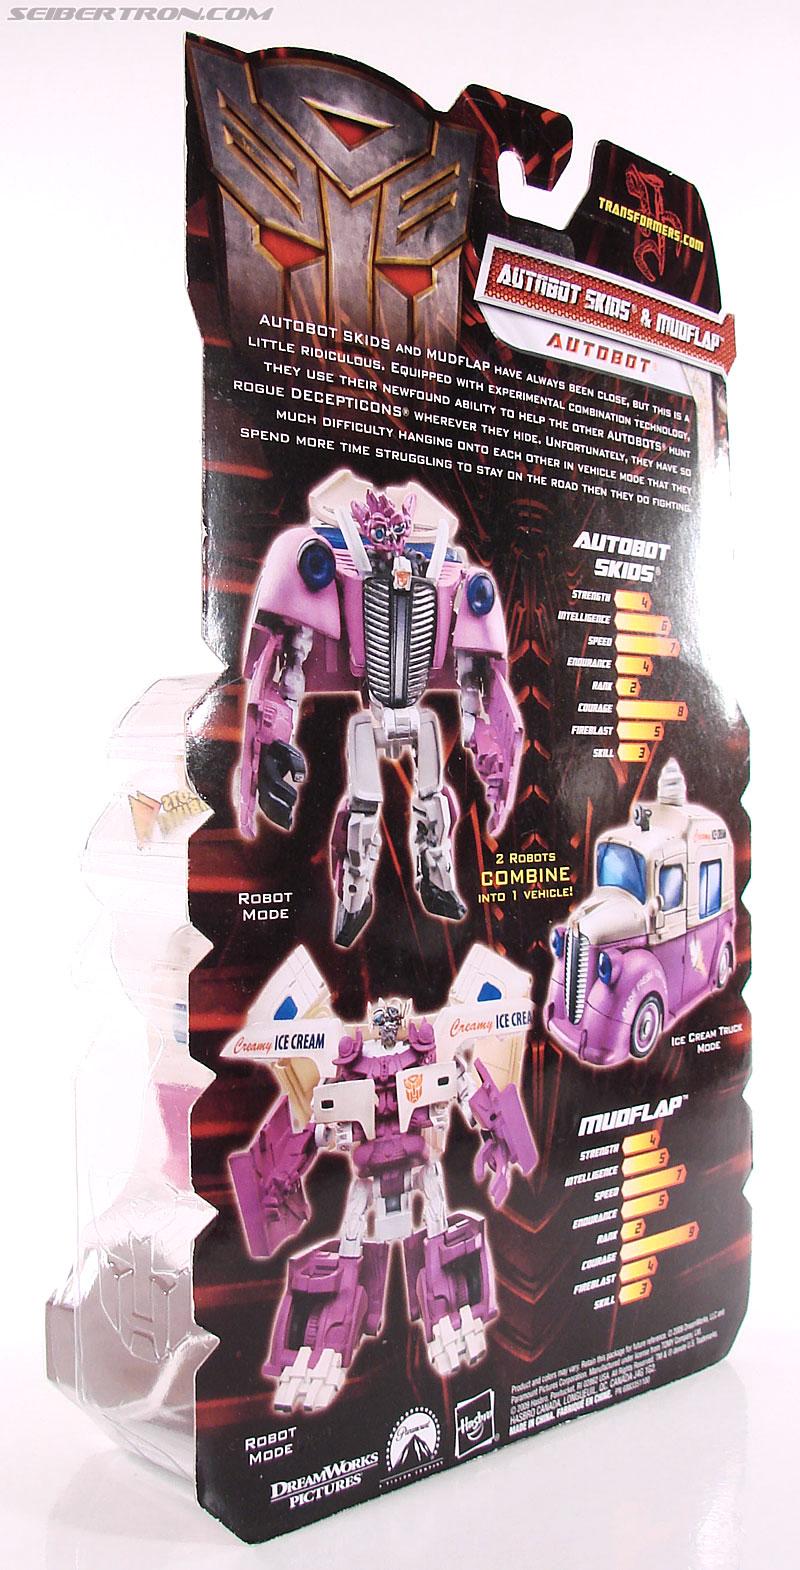 Transformers Revenge of the Fallen Skids (Ice Cream Truck) (Image #11 of 96)